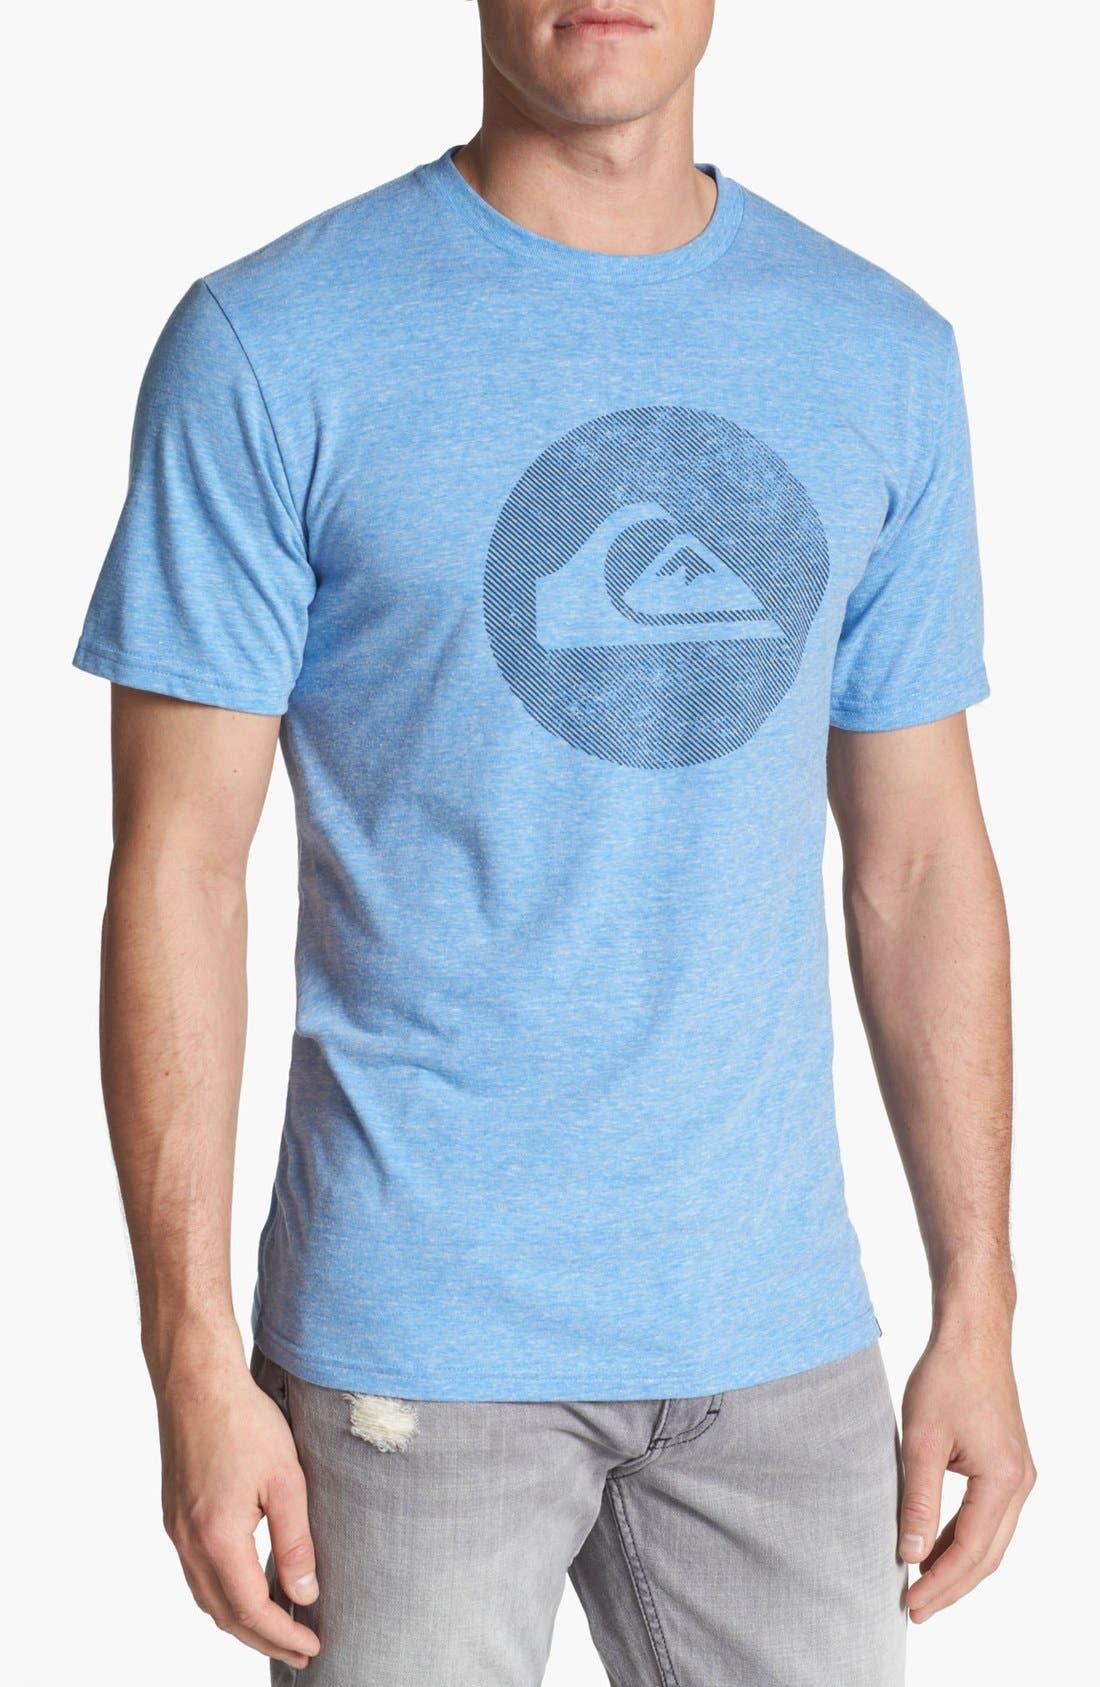 Alternate Image 1 Selected - Quiksilver 'Tilt' Graphic T-Shirt